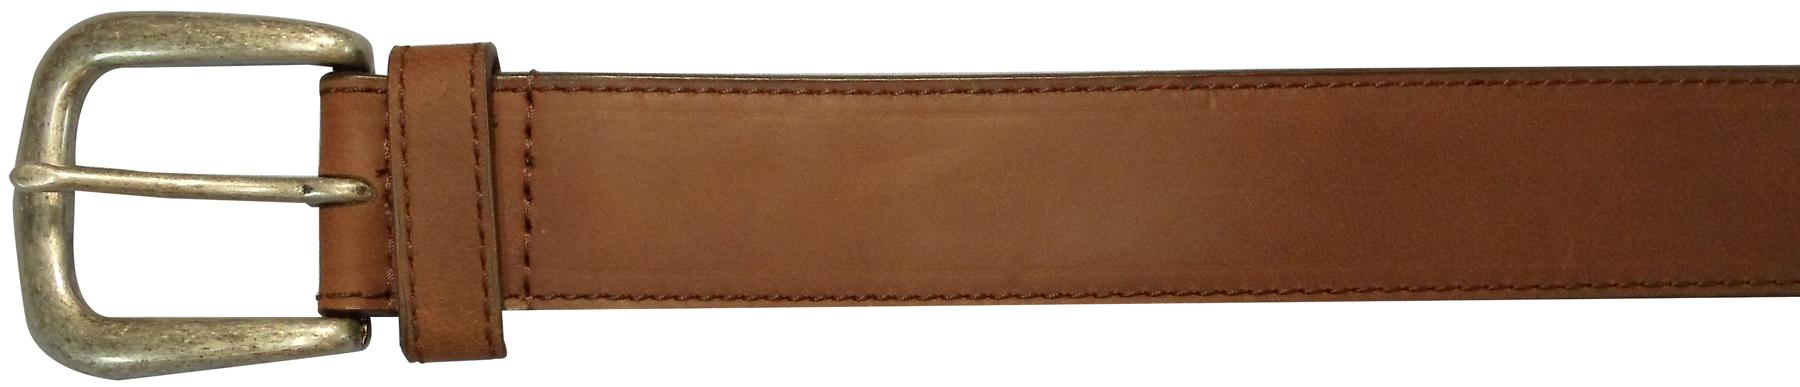 "10625410238 - 38"" Plain Brown Leather Field & Stream Belt"